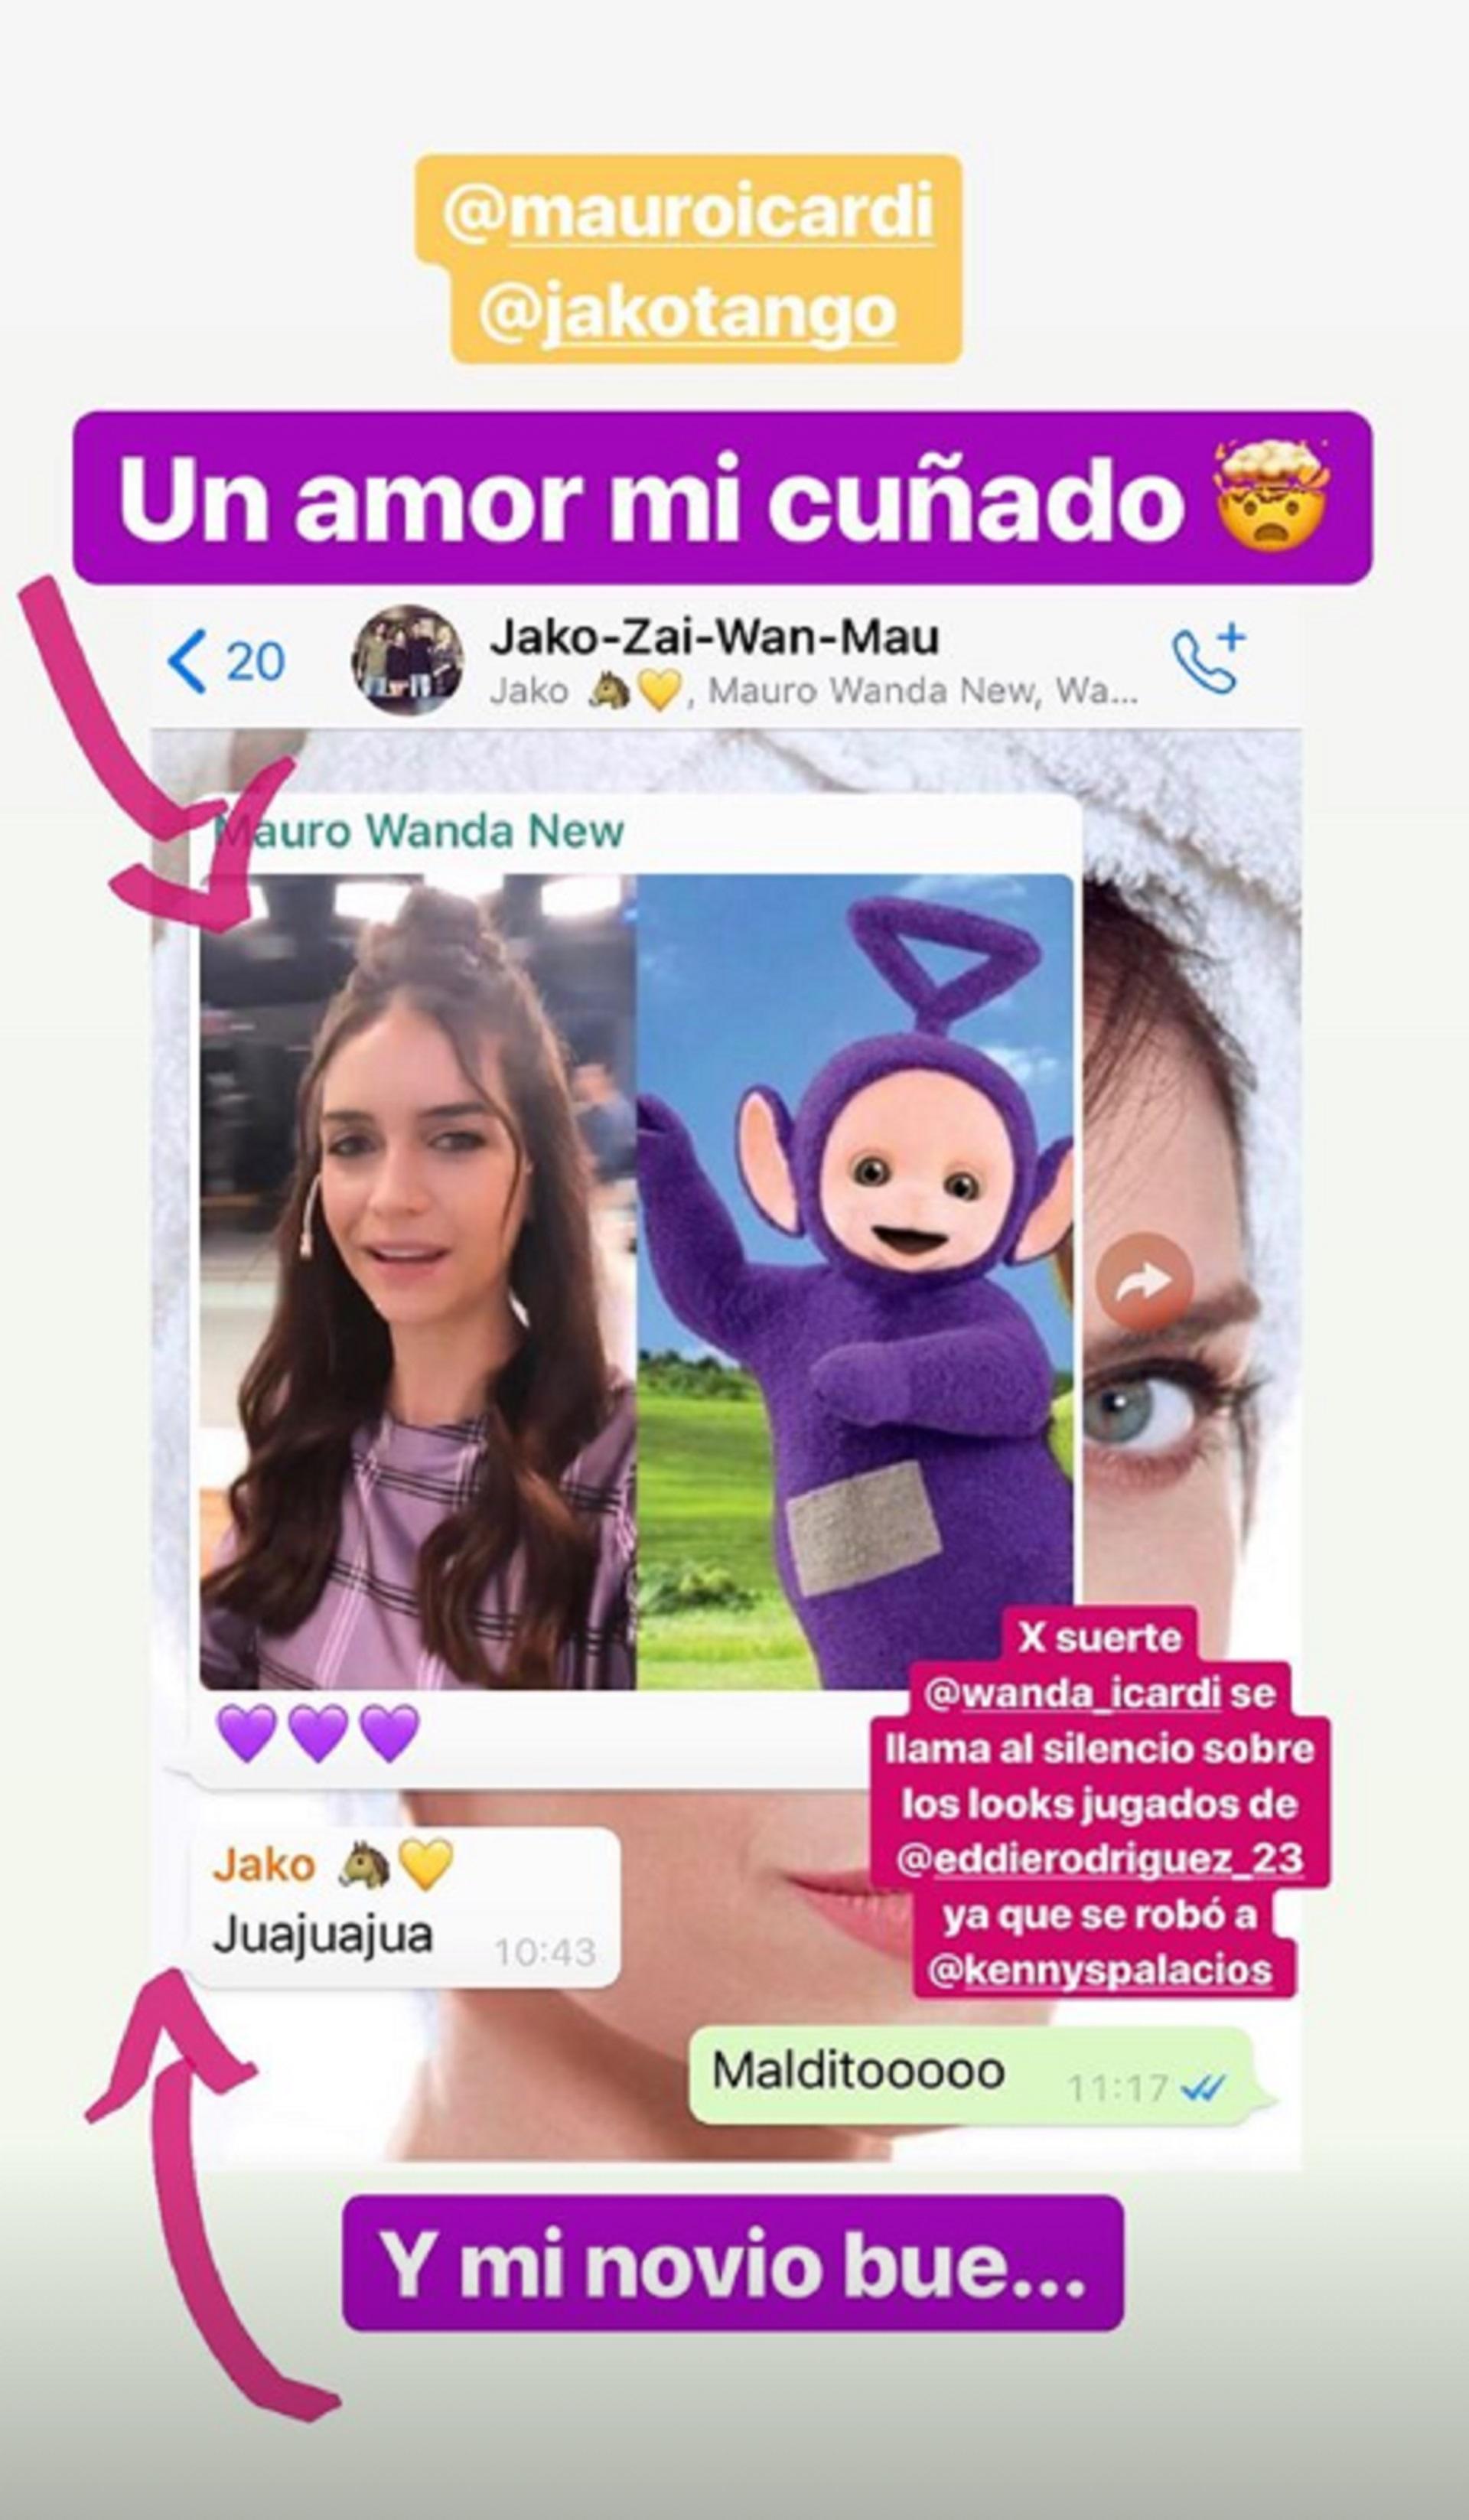 El mensaje de Zaira Nara que originó la reacción de Wanda